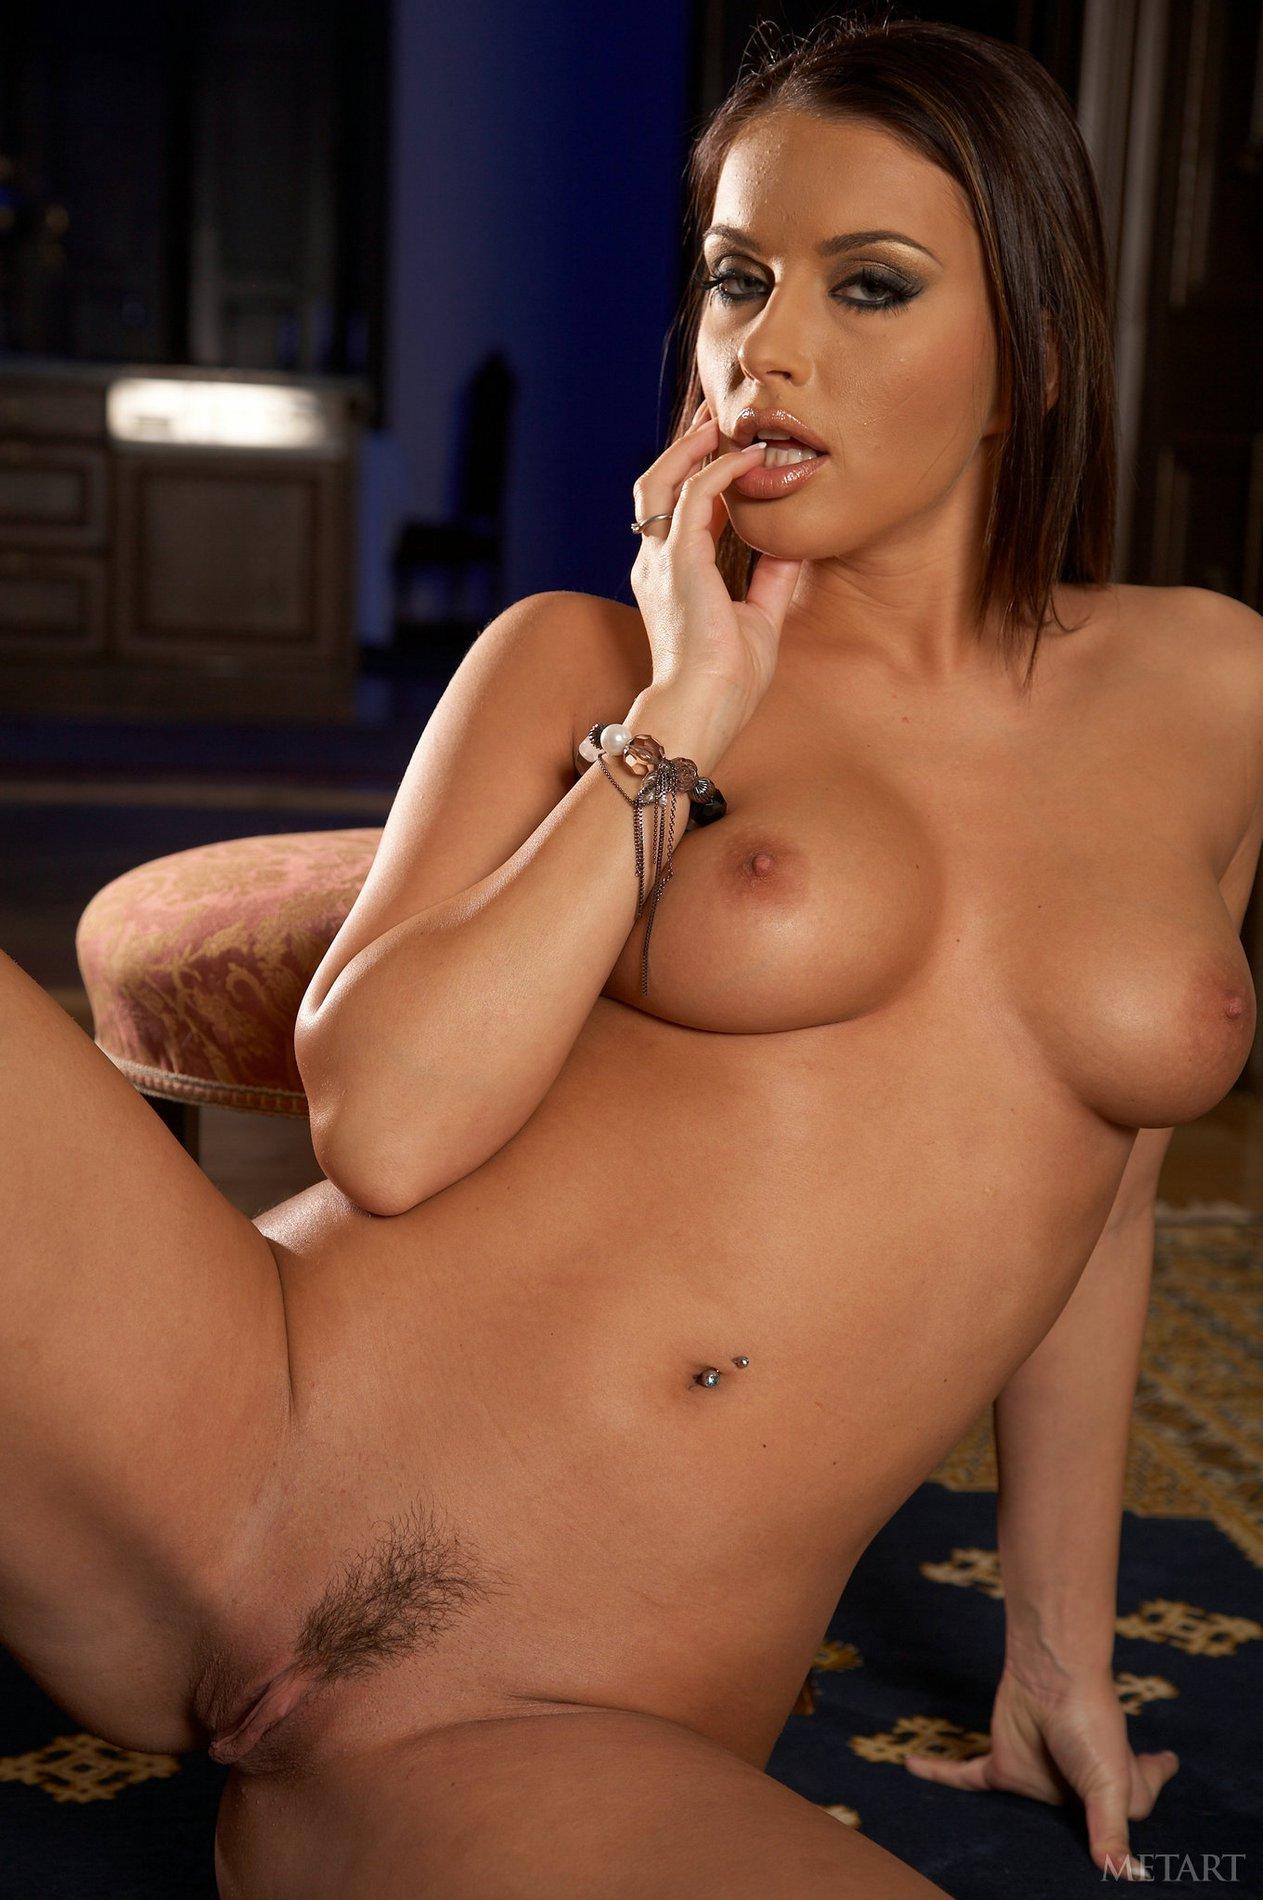 Marketa Brymova shows off her hot body - My Pornstar Book